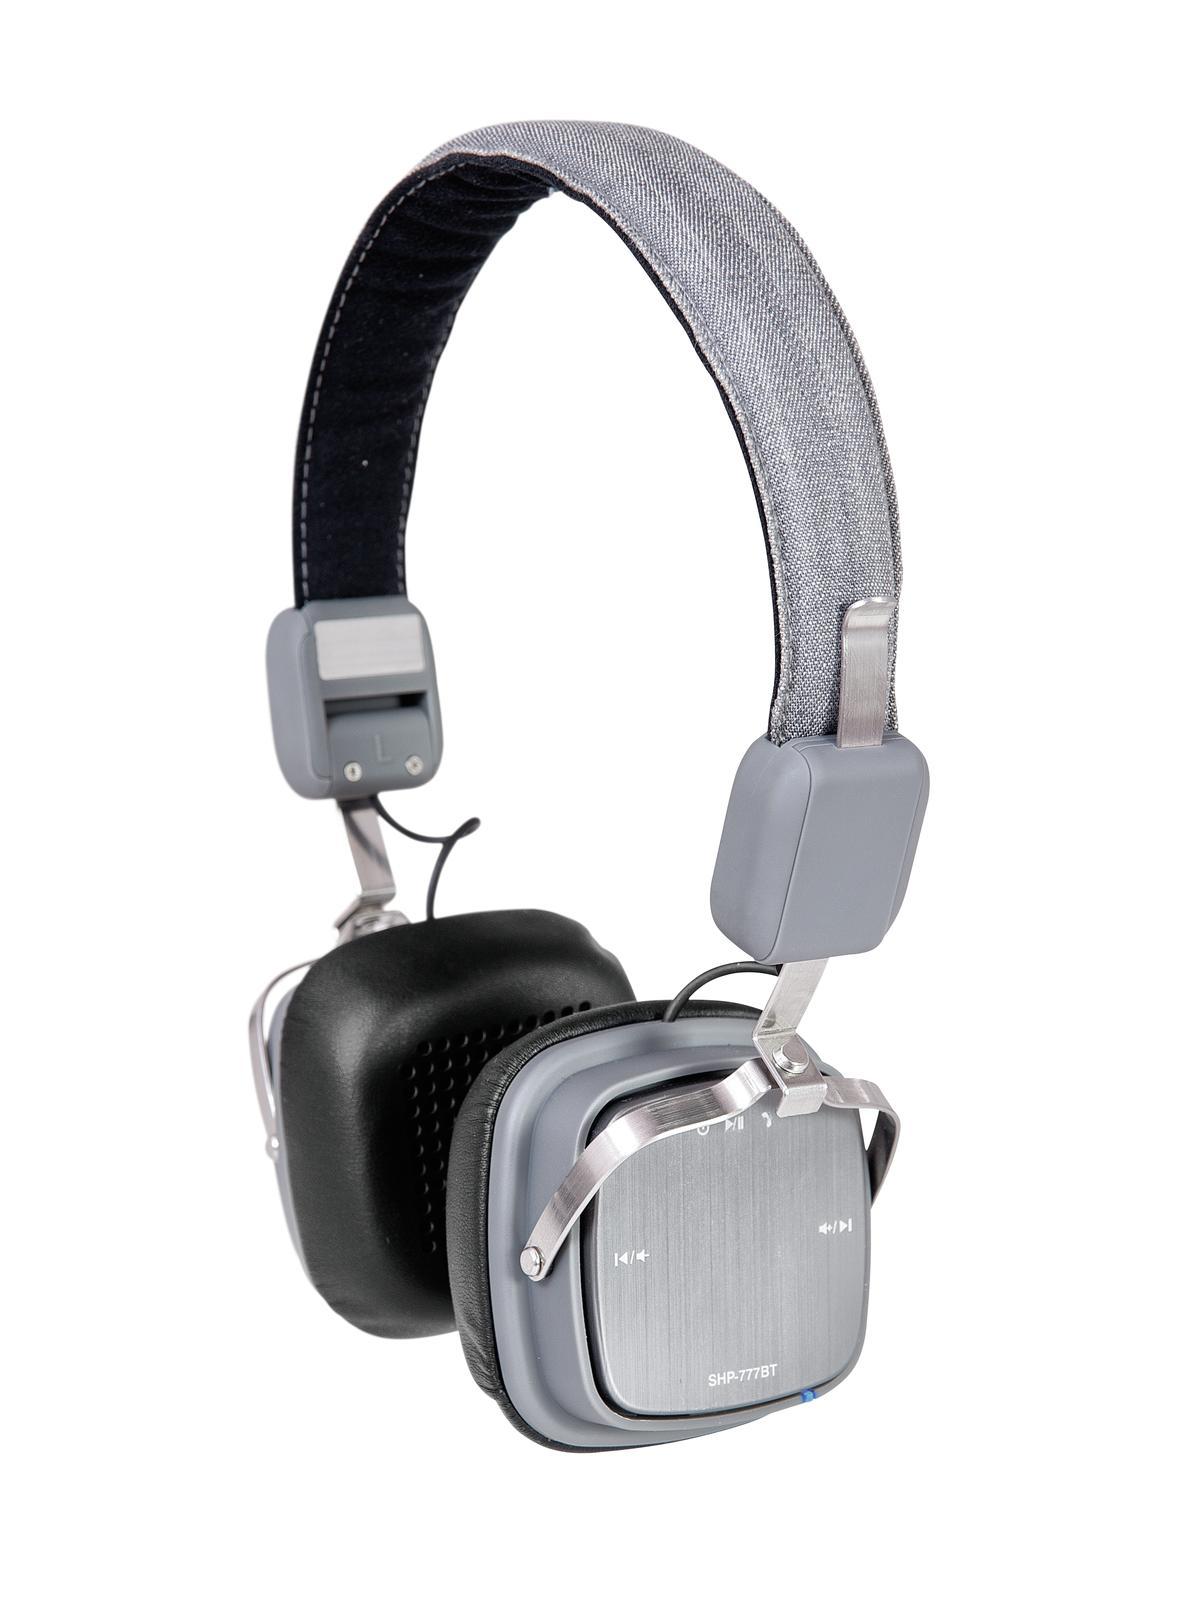 OMNITRONIC SHP-777BT Cuffie stereo auricolare per DJ Bluetooth